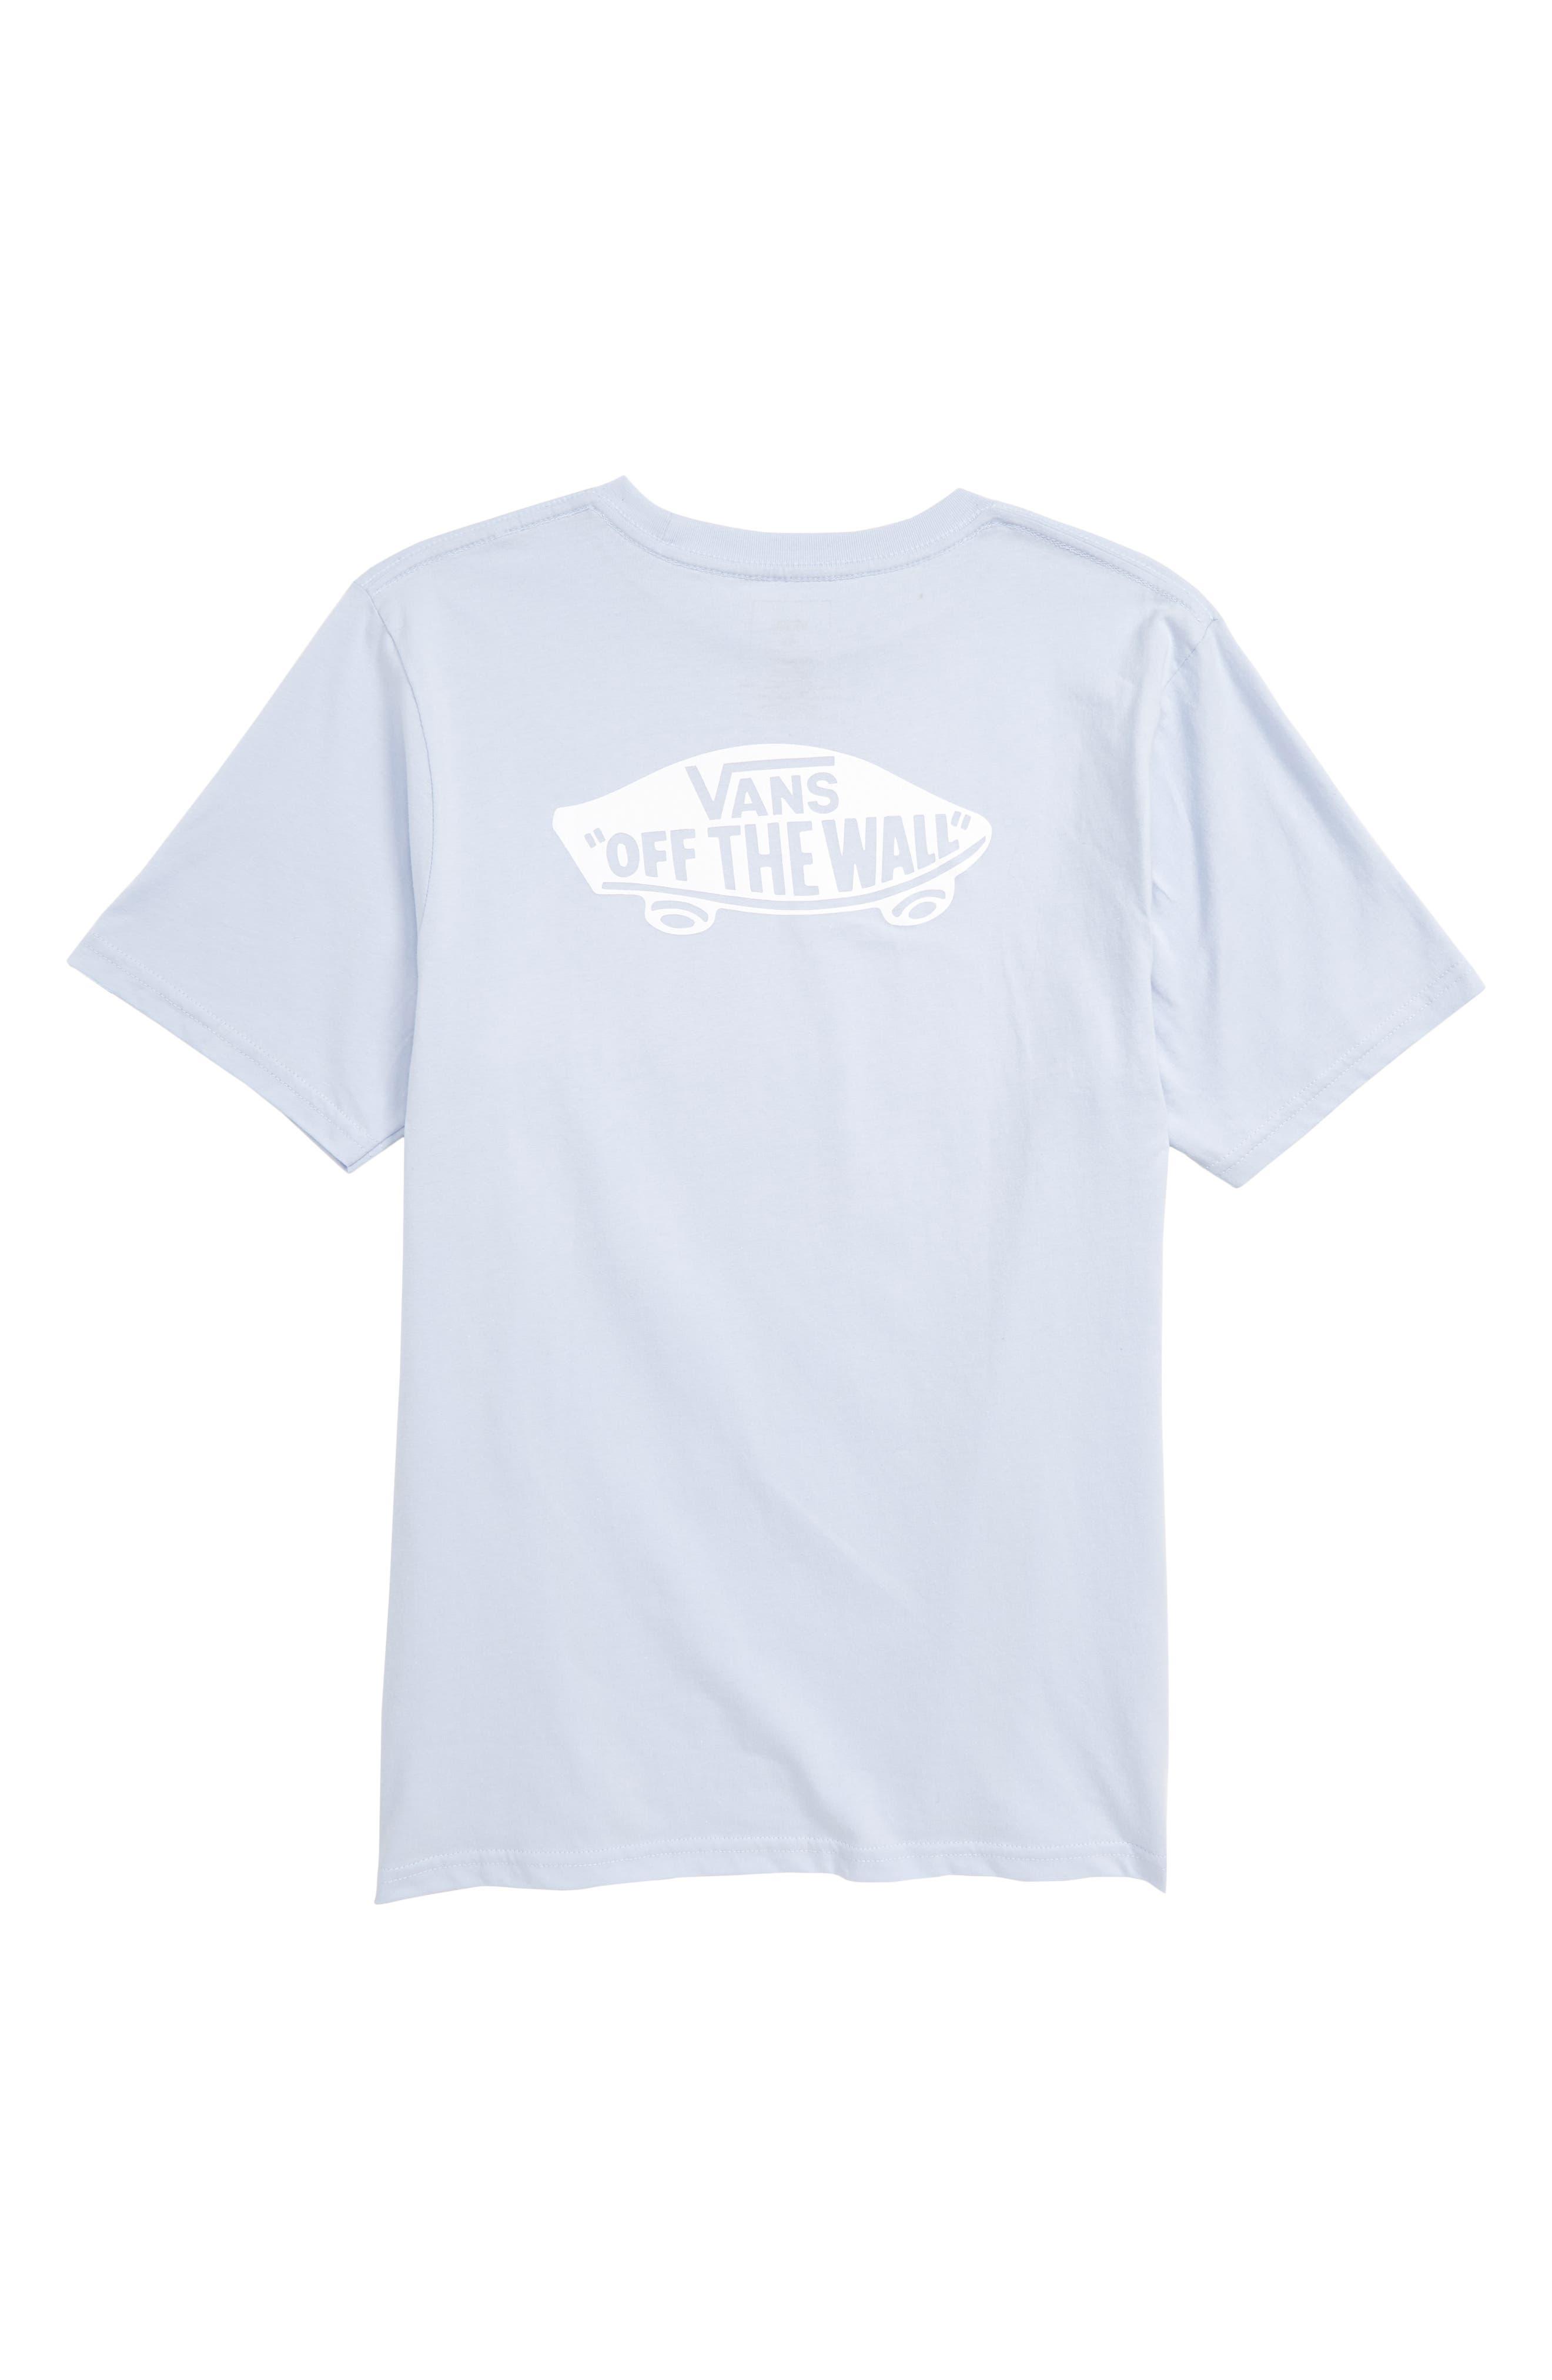 be84963a30 Boys  Vans Clothing  Hoodies